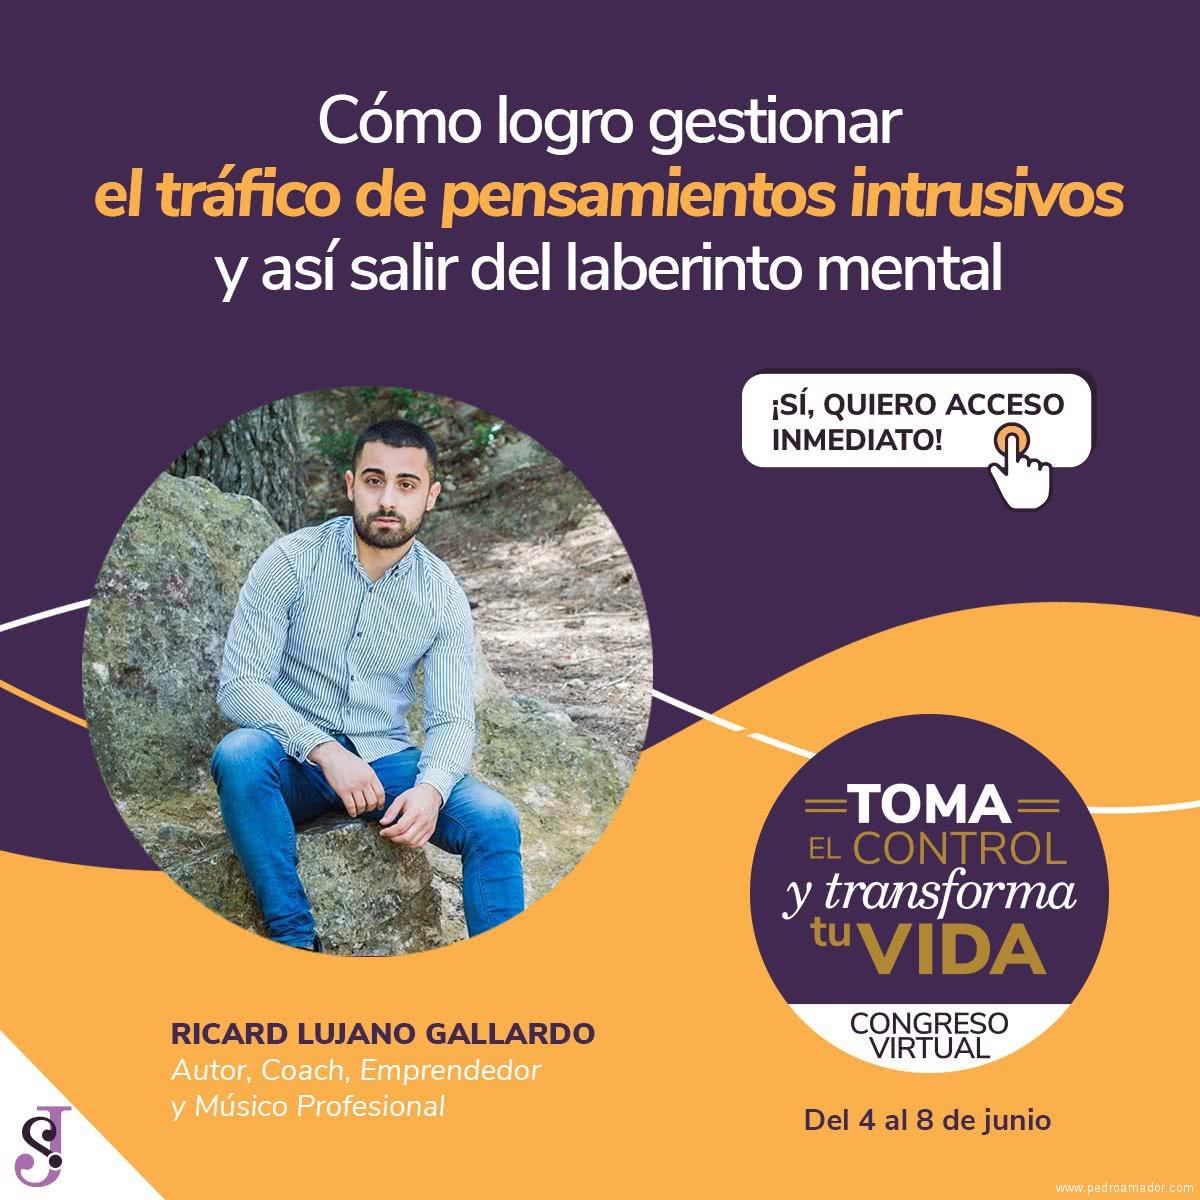 Transforma tu vida - Ricard Lujano Gallardo